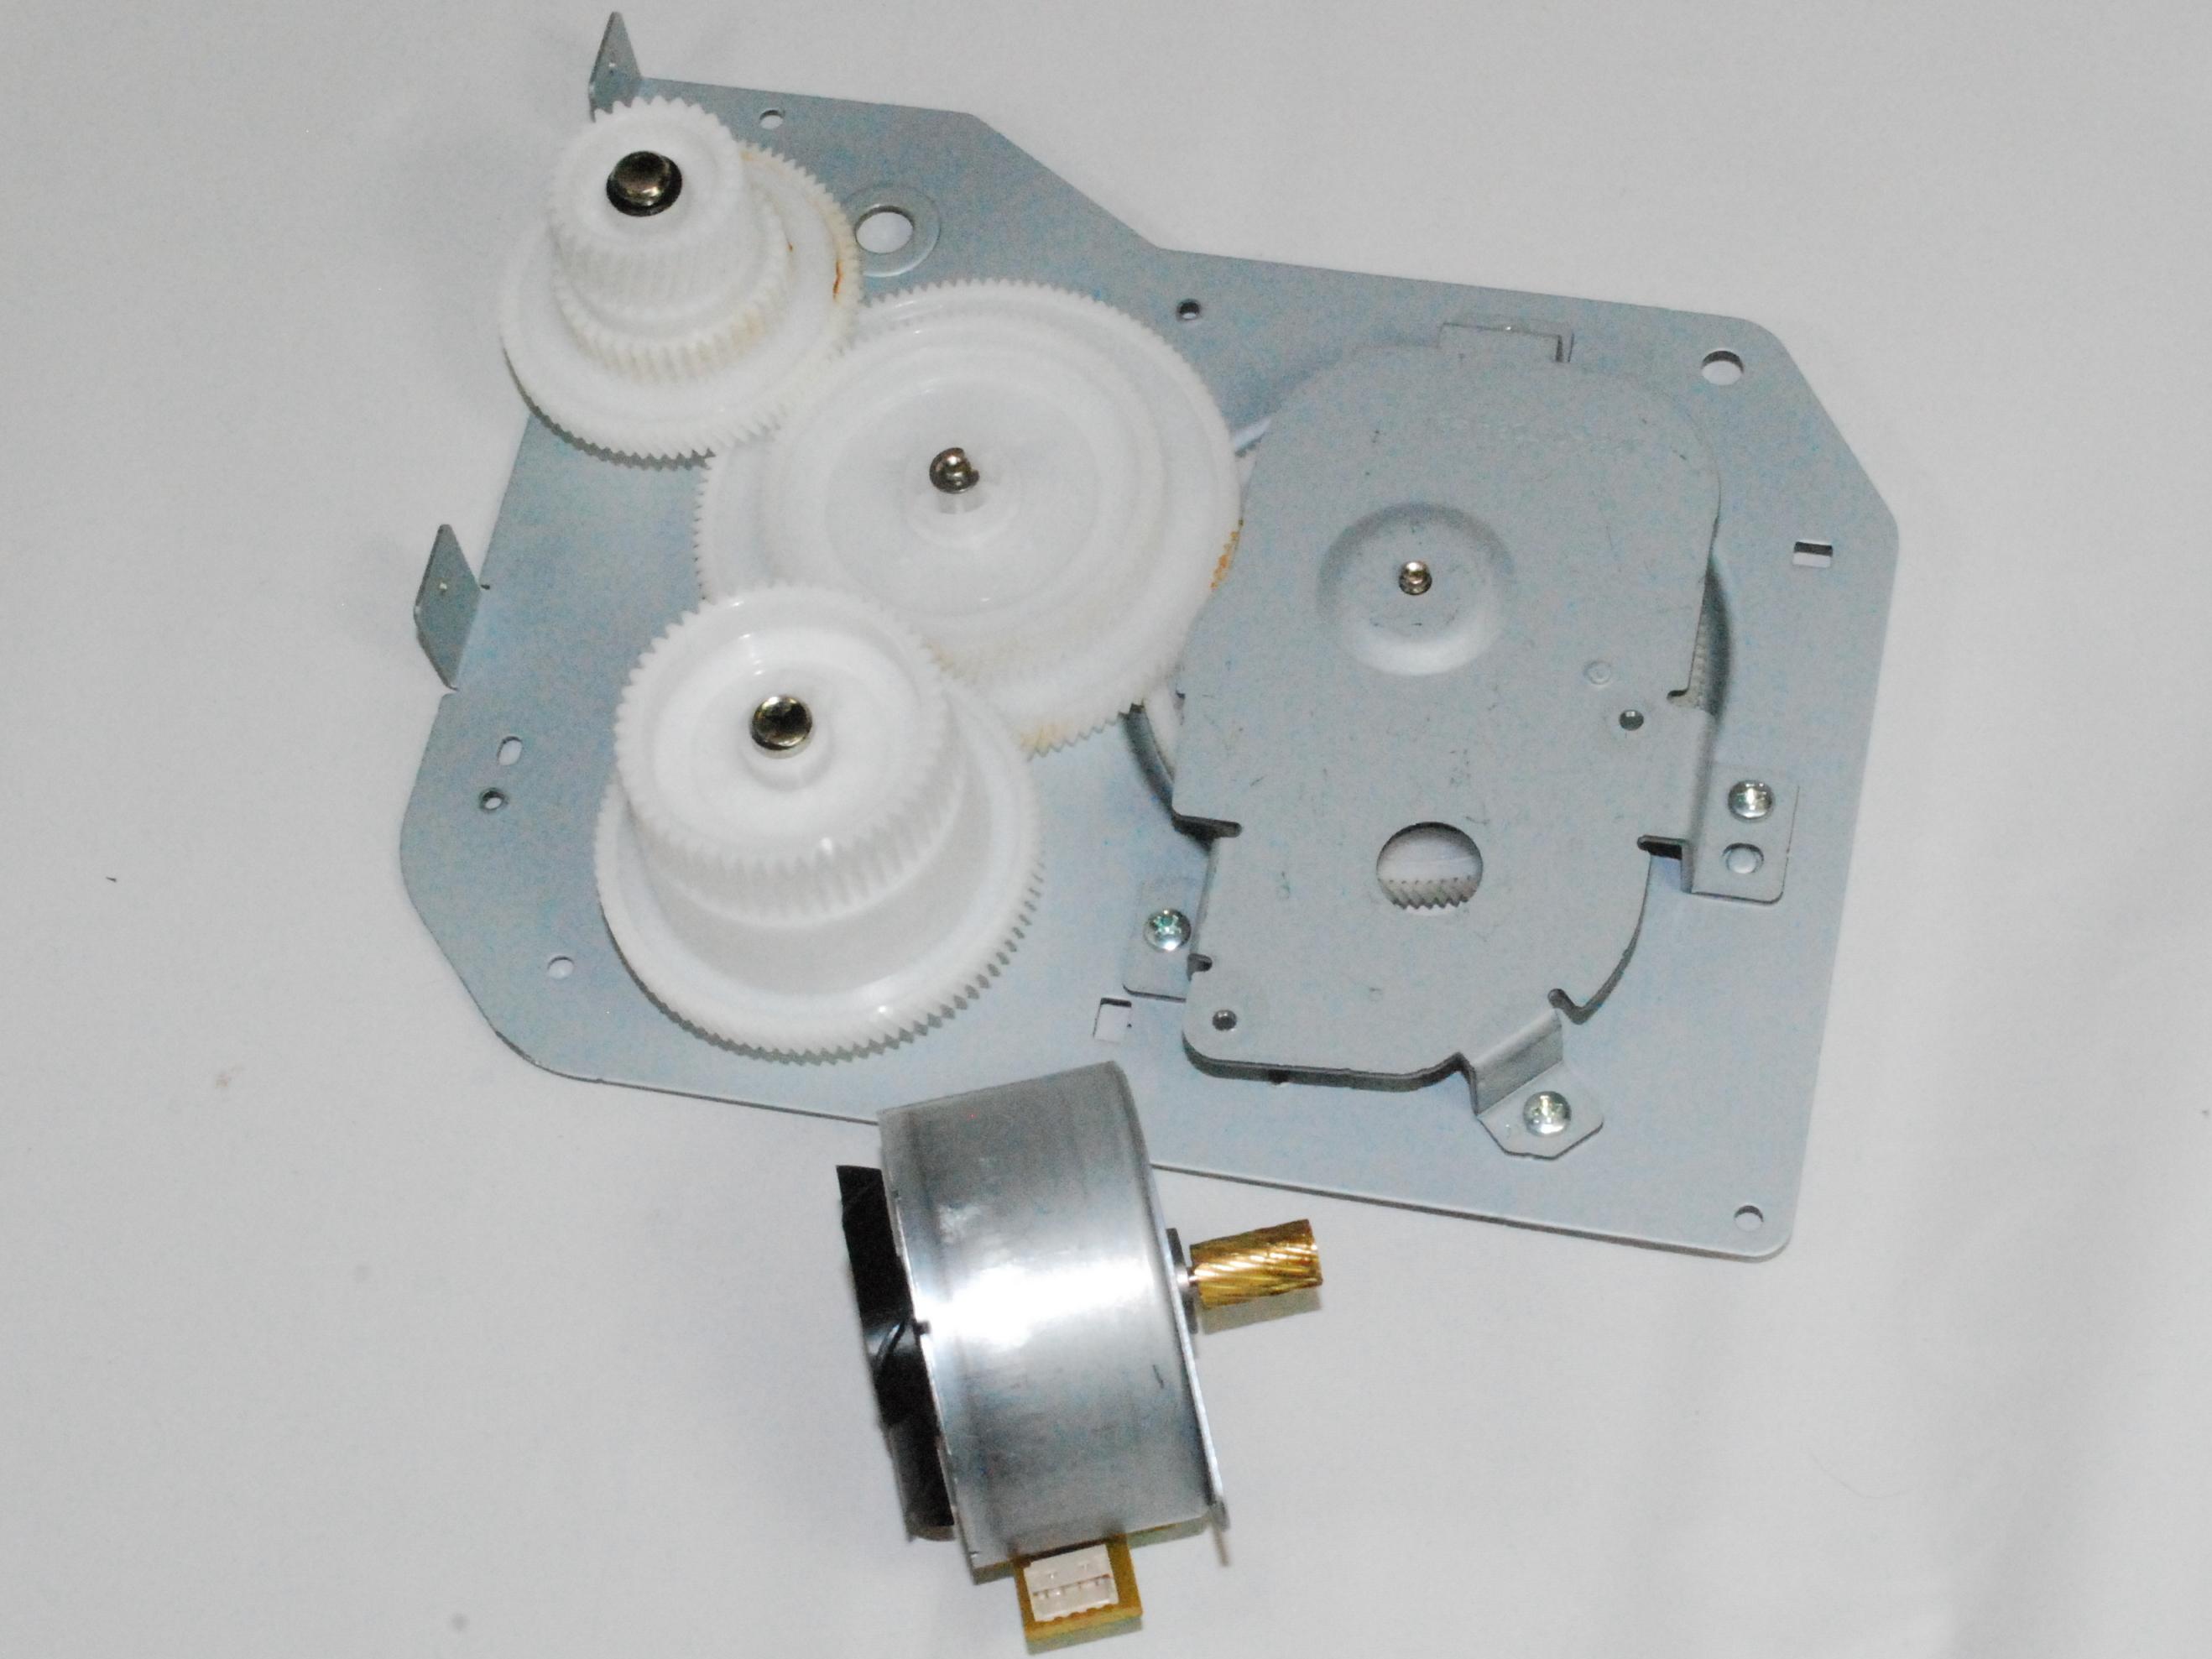 Samsung-ml-2571n-service-manual. Pdf | electrostatic discharge.